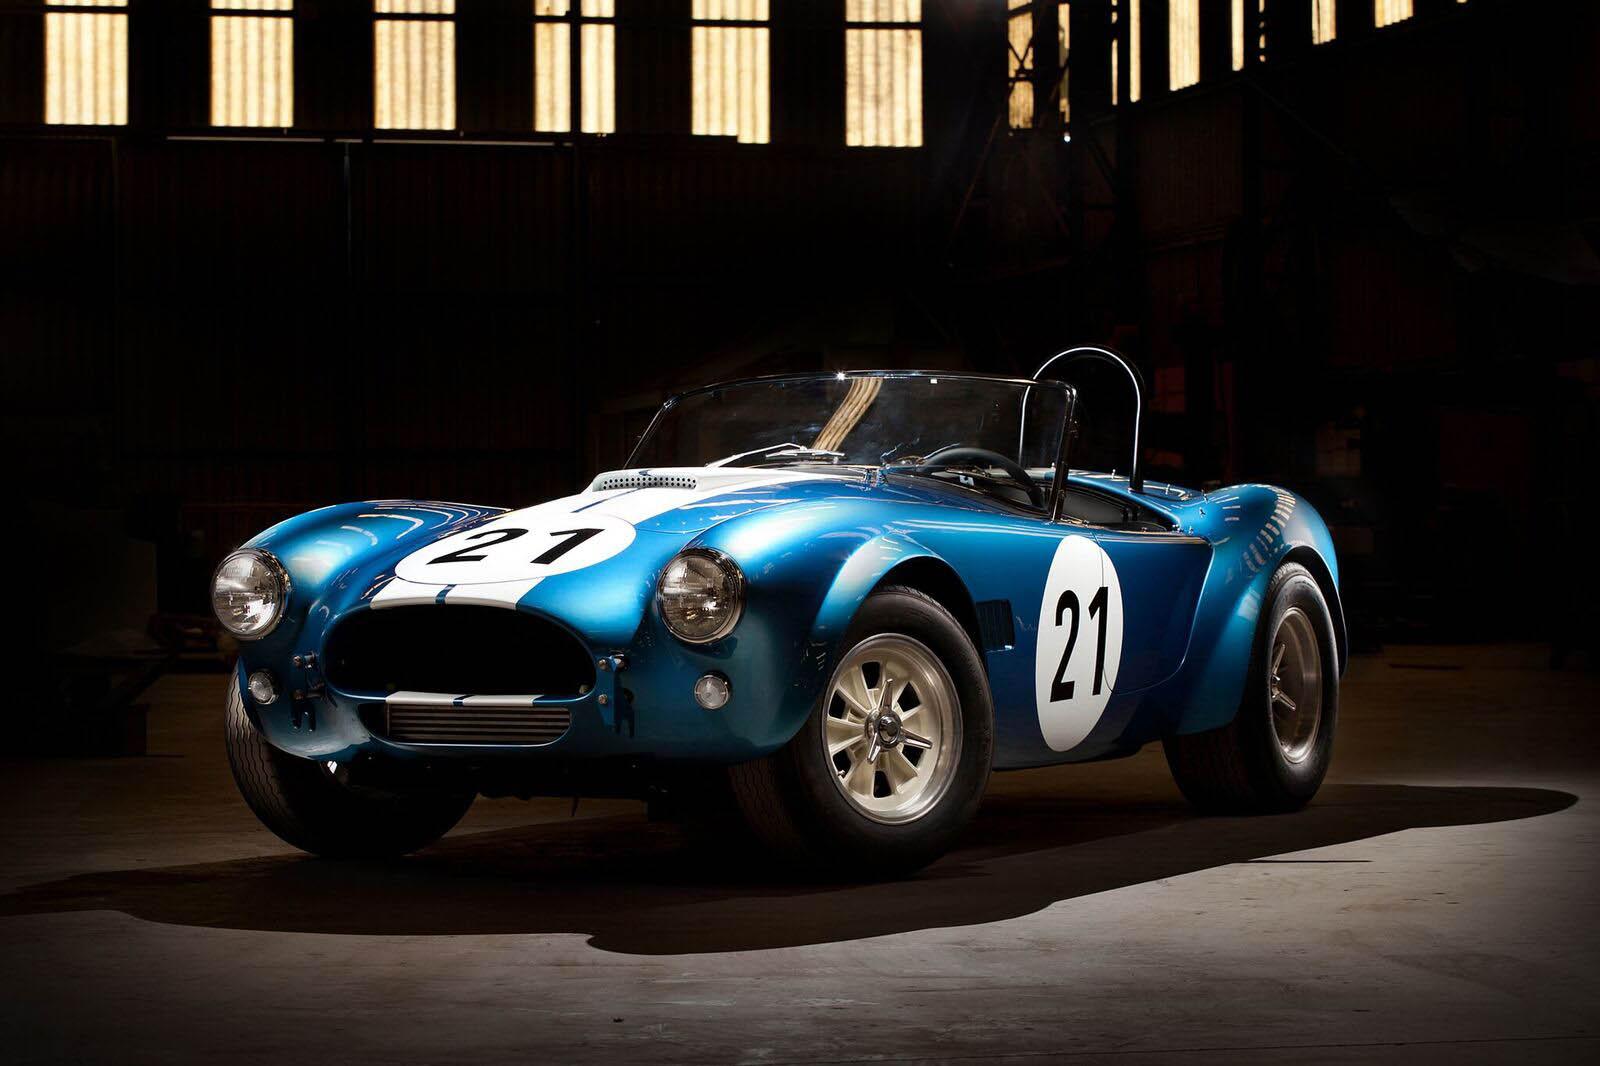 These Shelby Cobra Continuation Models Honor Bob Bondurant's Driving School - autoevolution